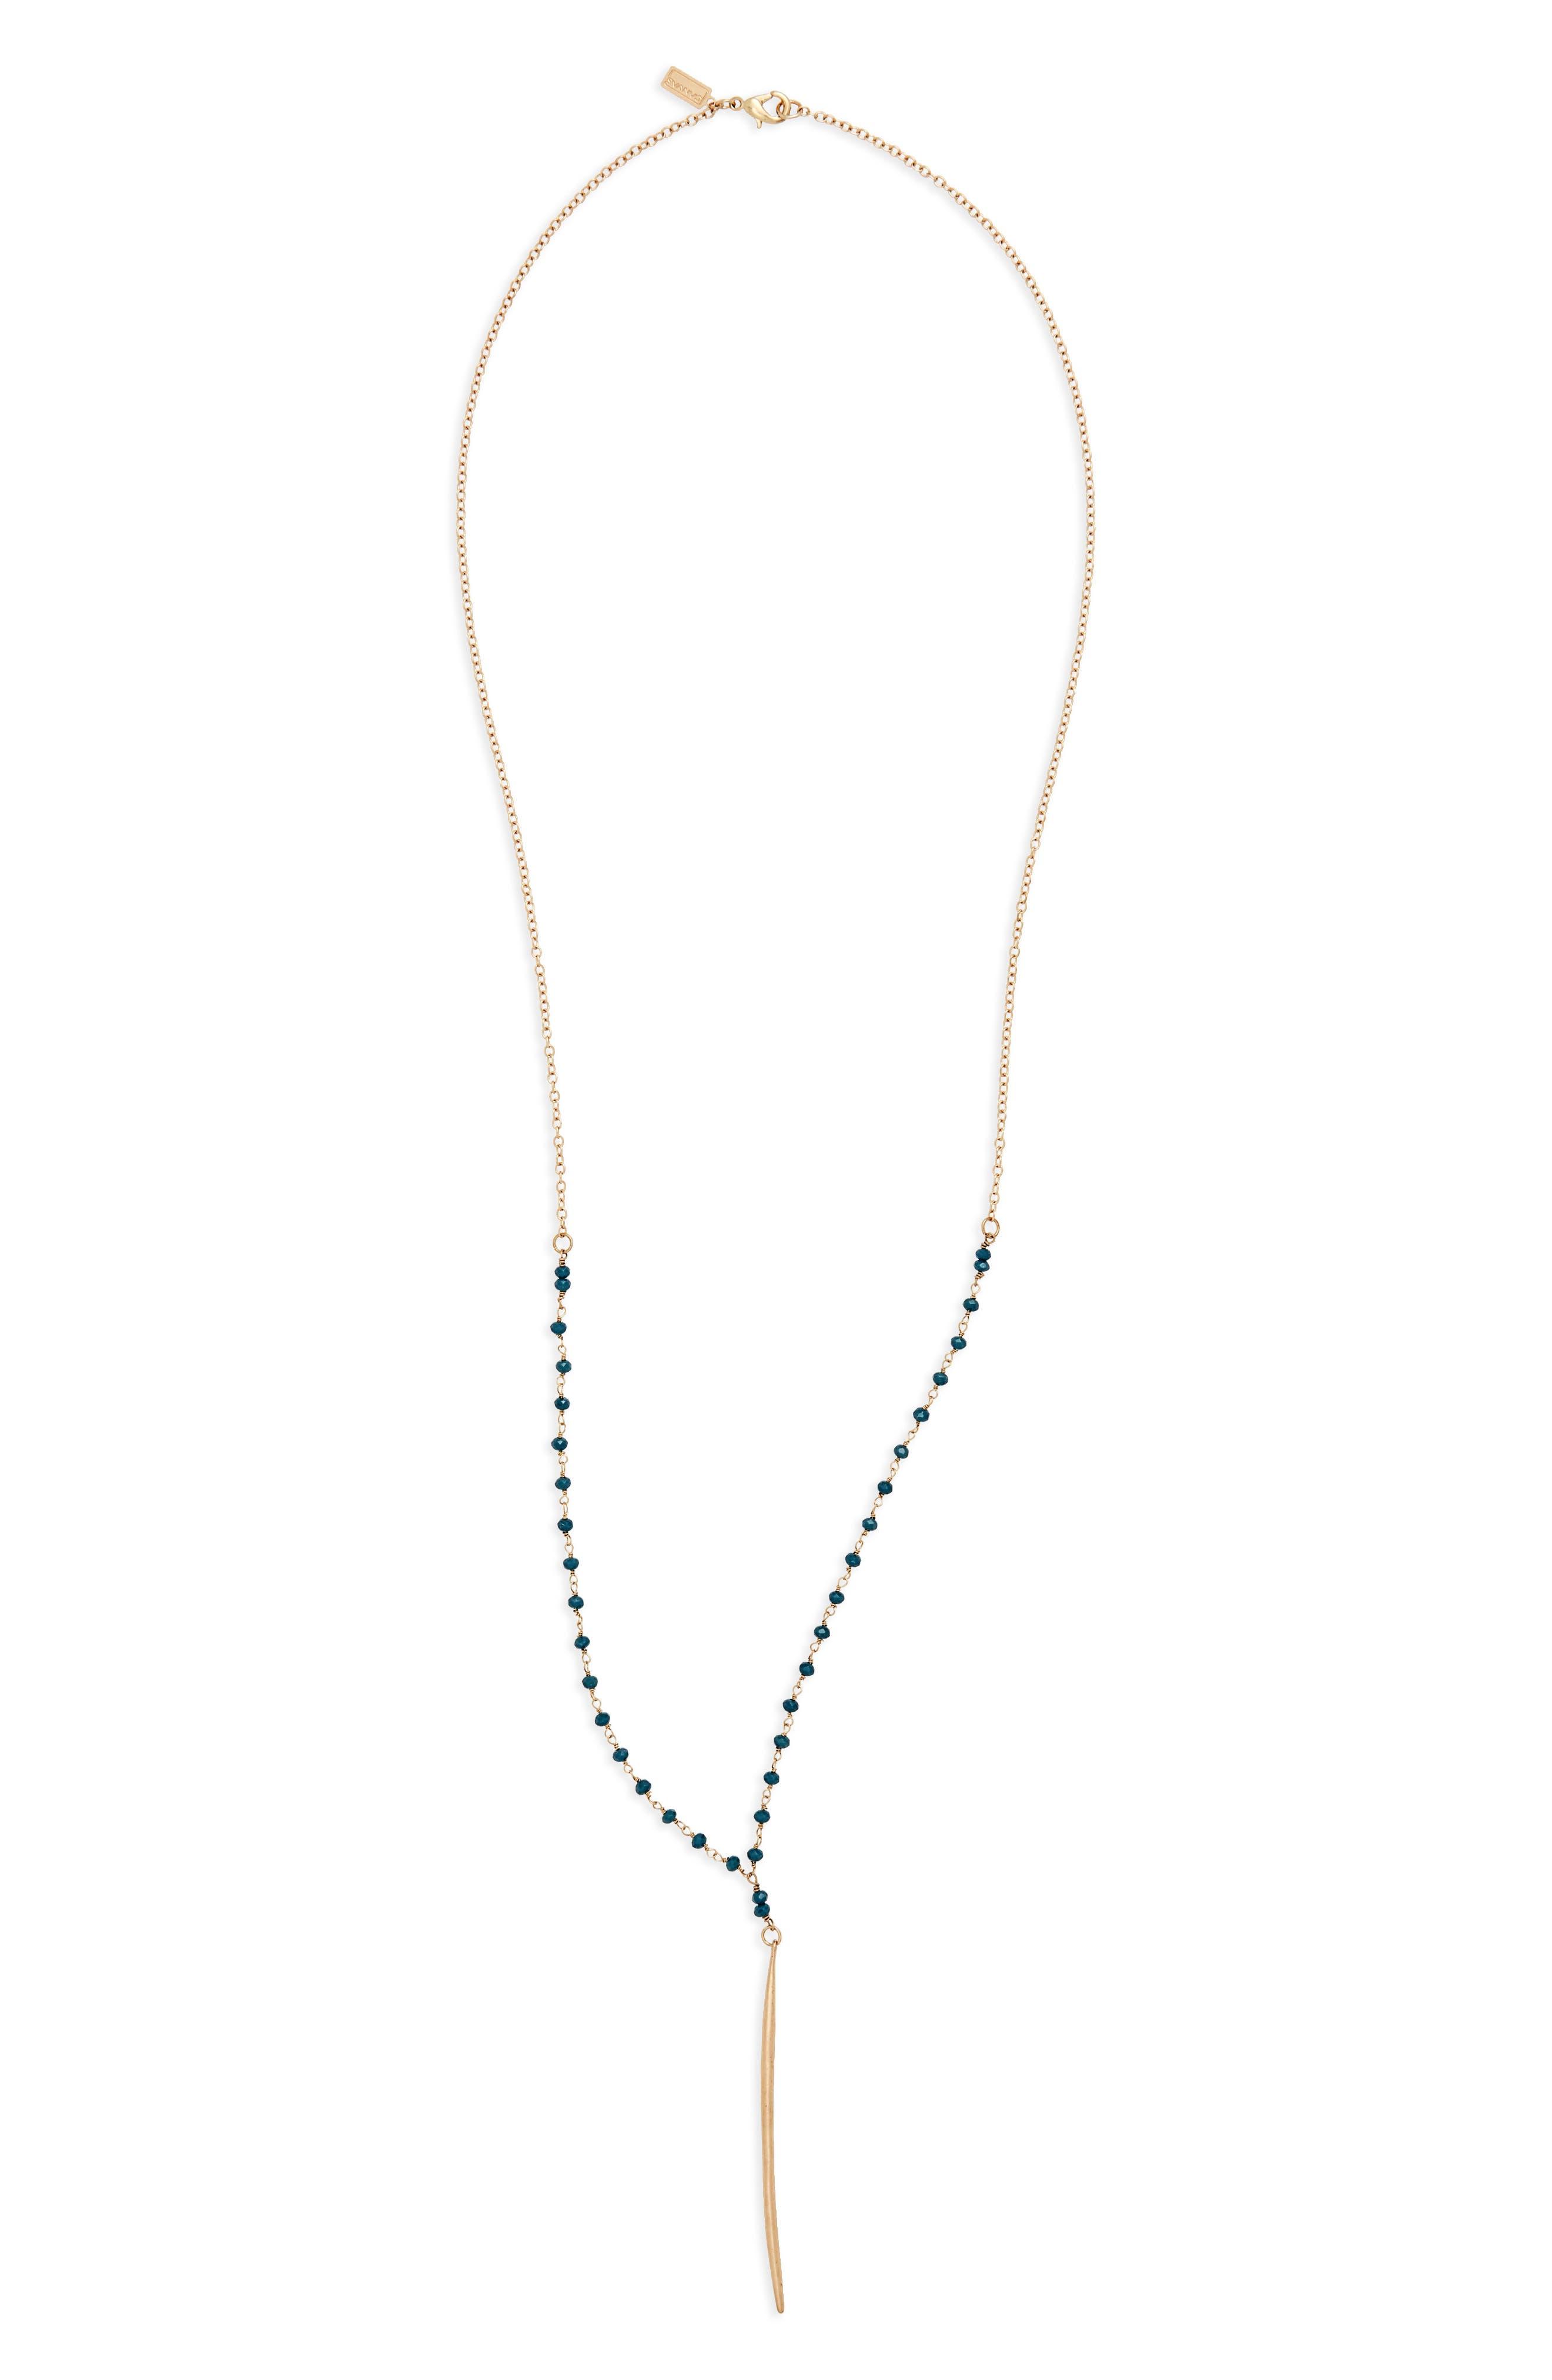 Bead & Pendant Necklace,                             Main thumbnail 1, color,                             300